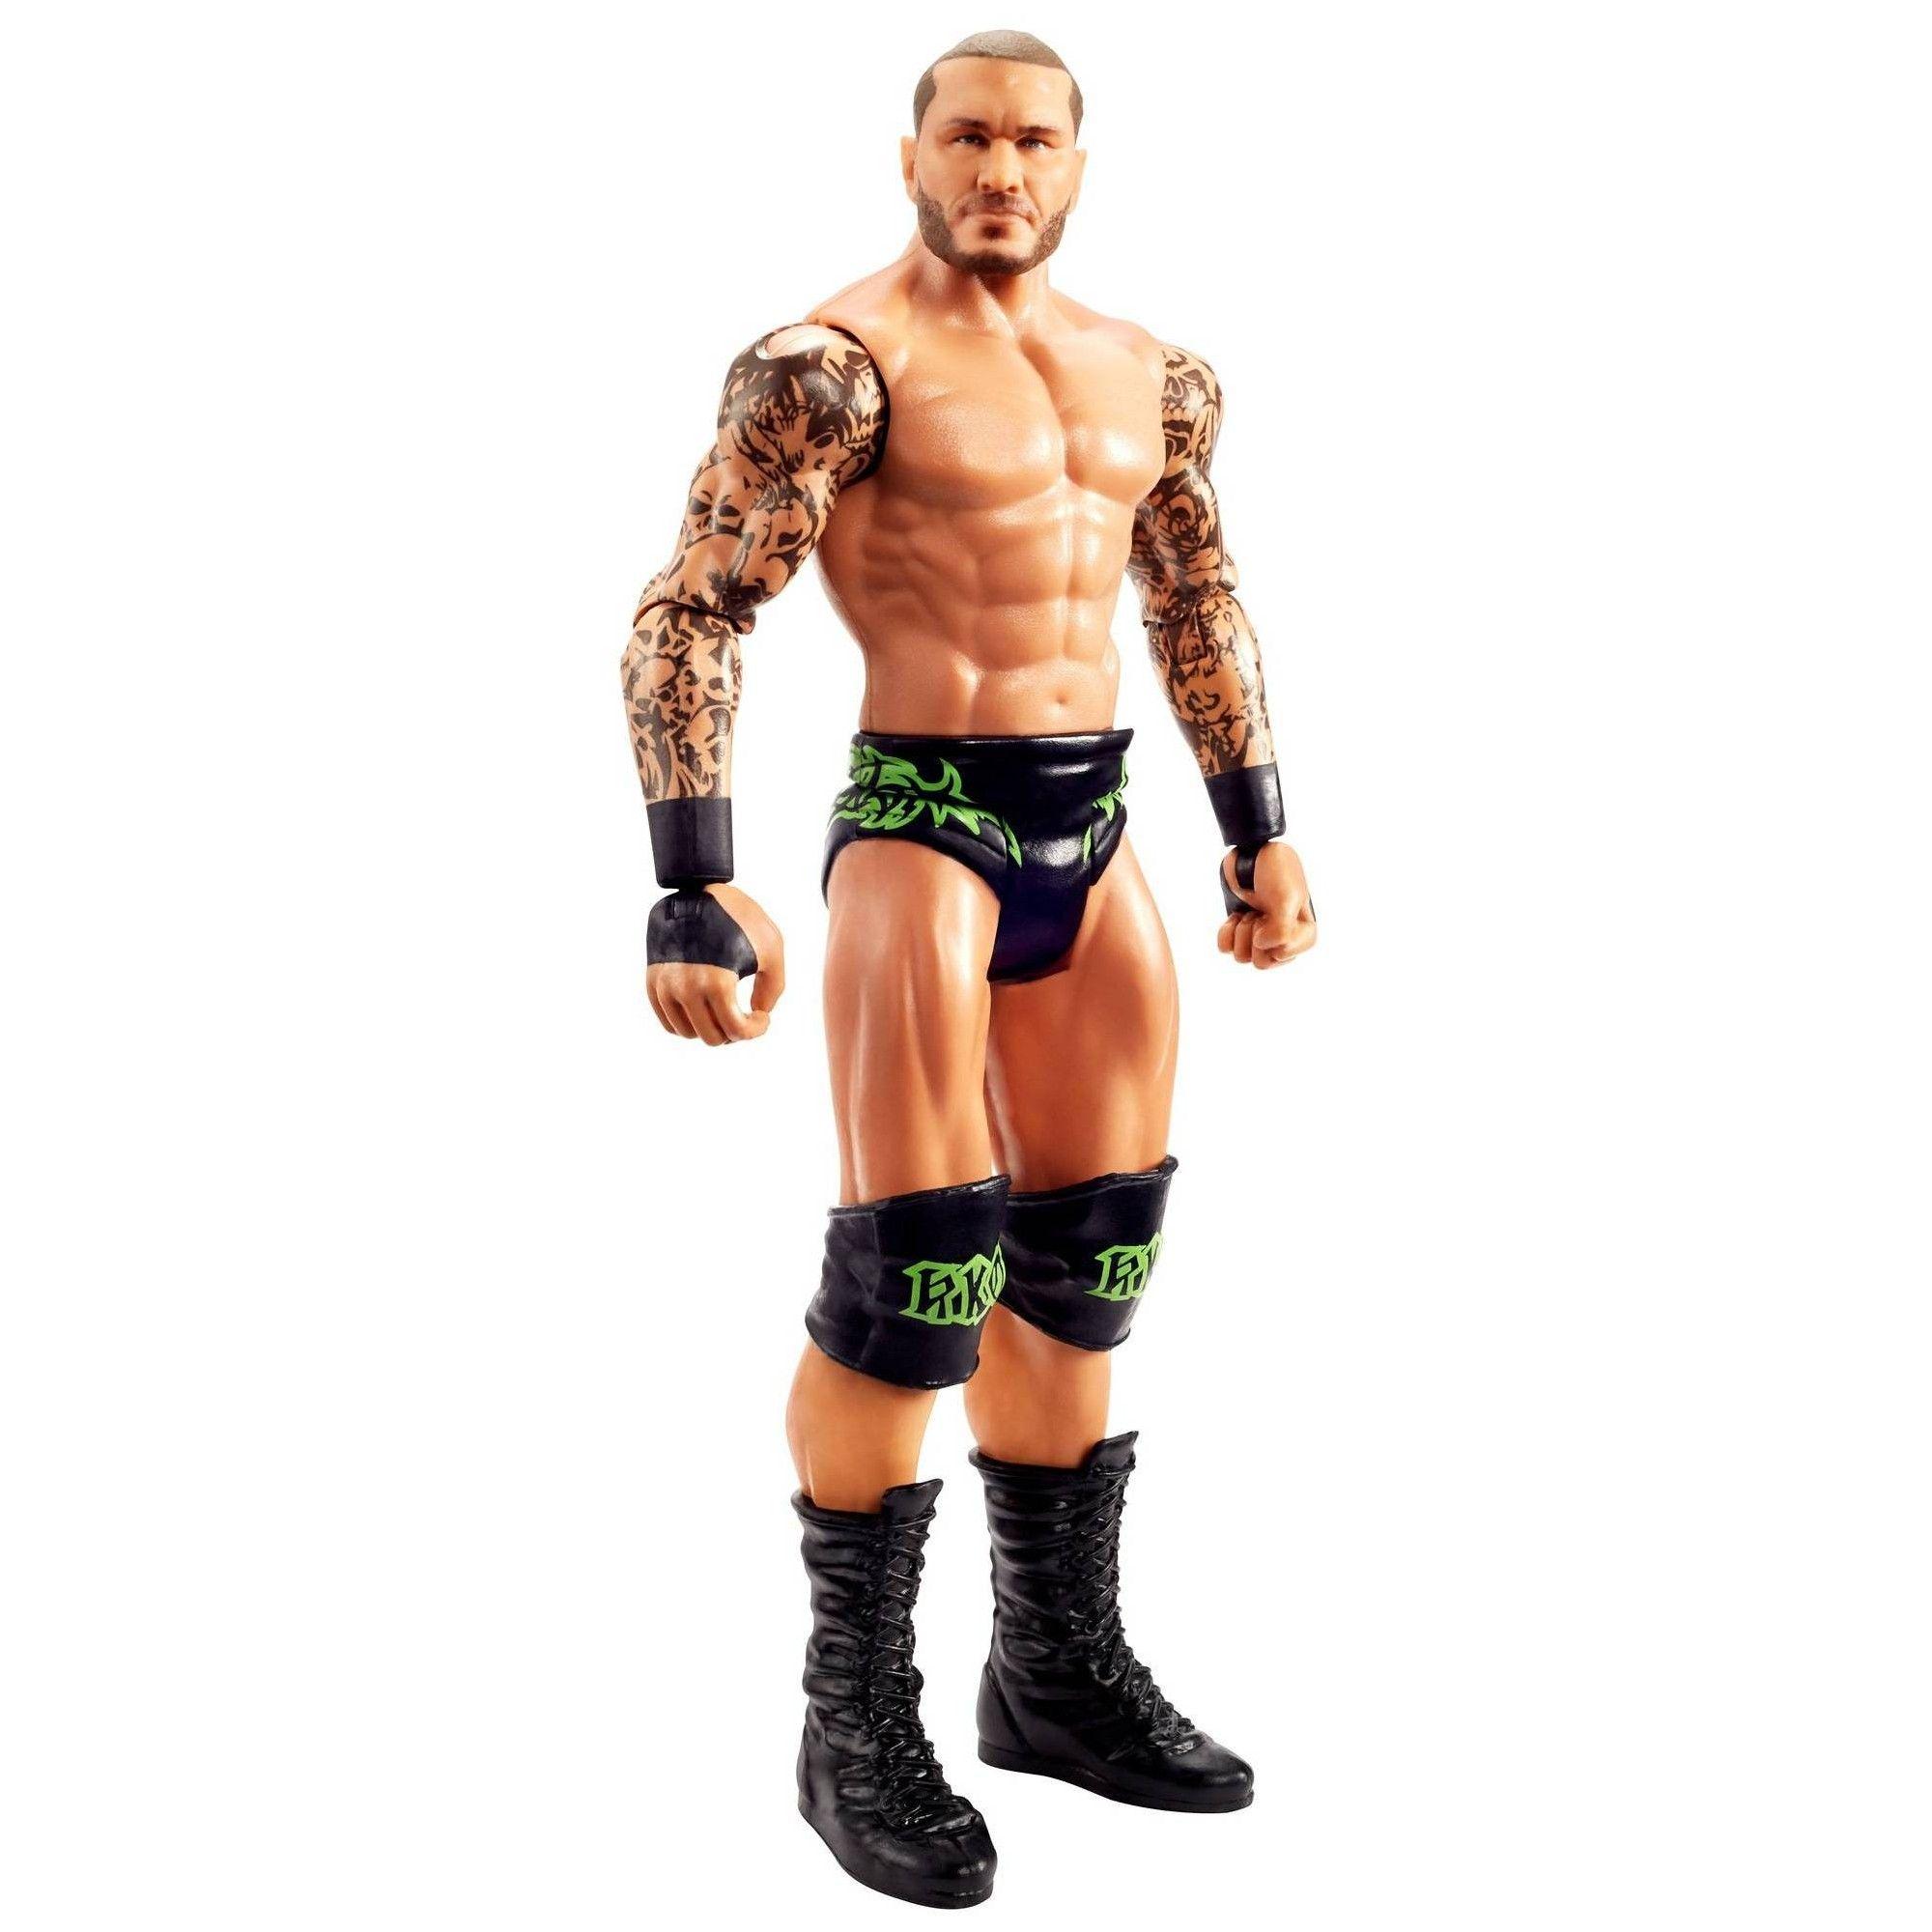 Wwe Randy Orton Action Figure Series 104 Randy Orton Action Figure Action Figures Wwe